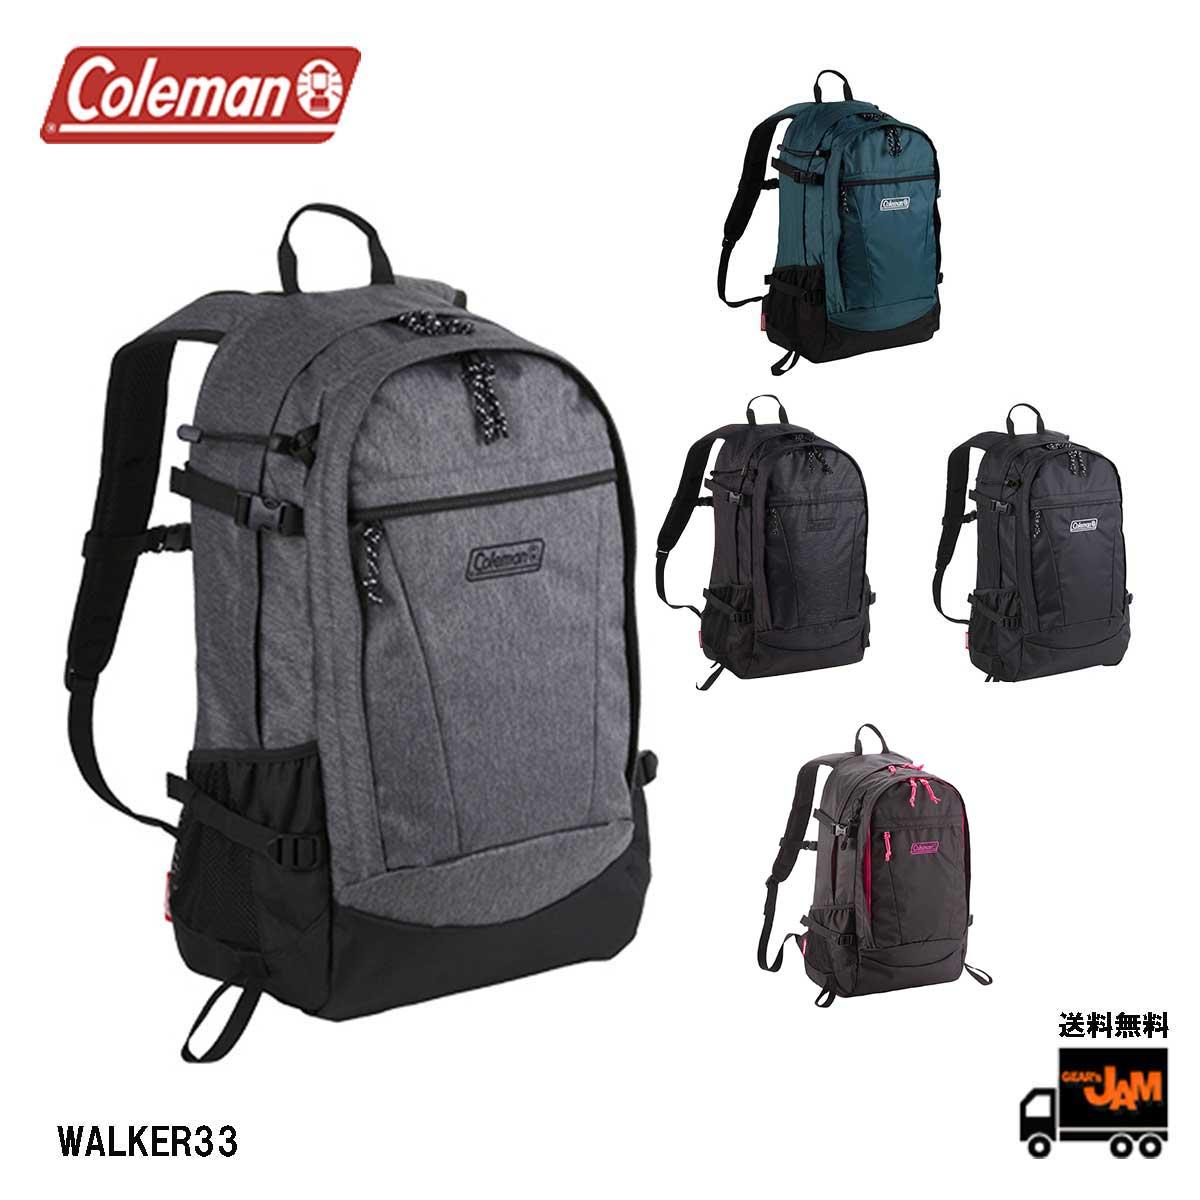 Coleman 品質保証 コールマン WALKER33 ウォーカー33 アウトドア リュックサック リュック 33L スーパーセール デイパック 送料無料 レディース B4 メンズ